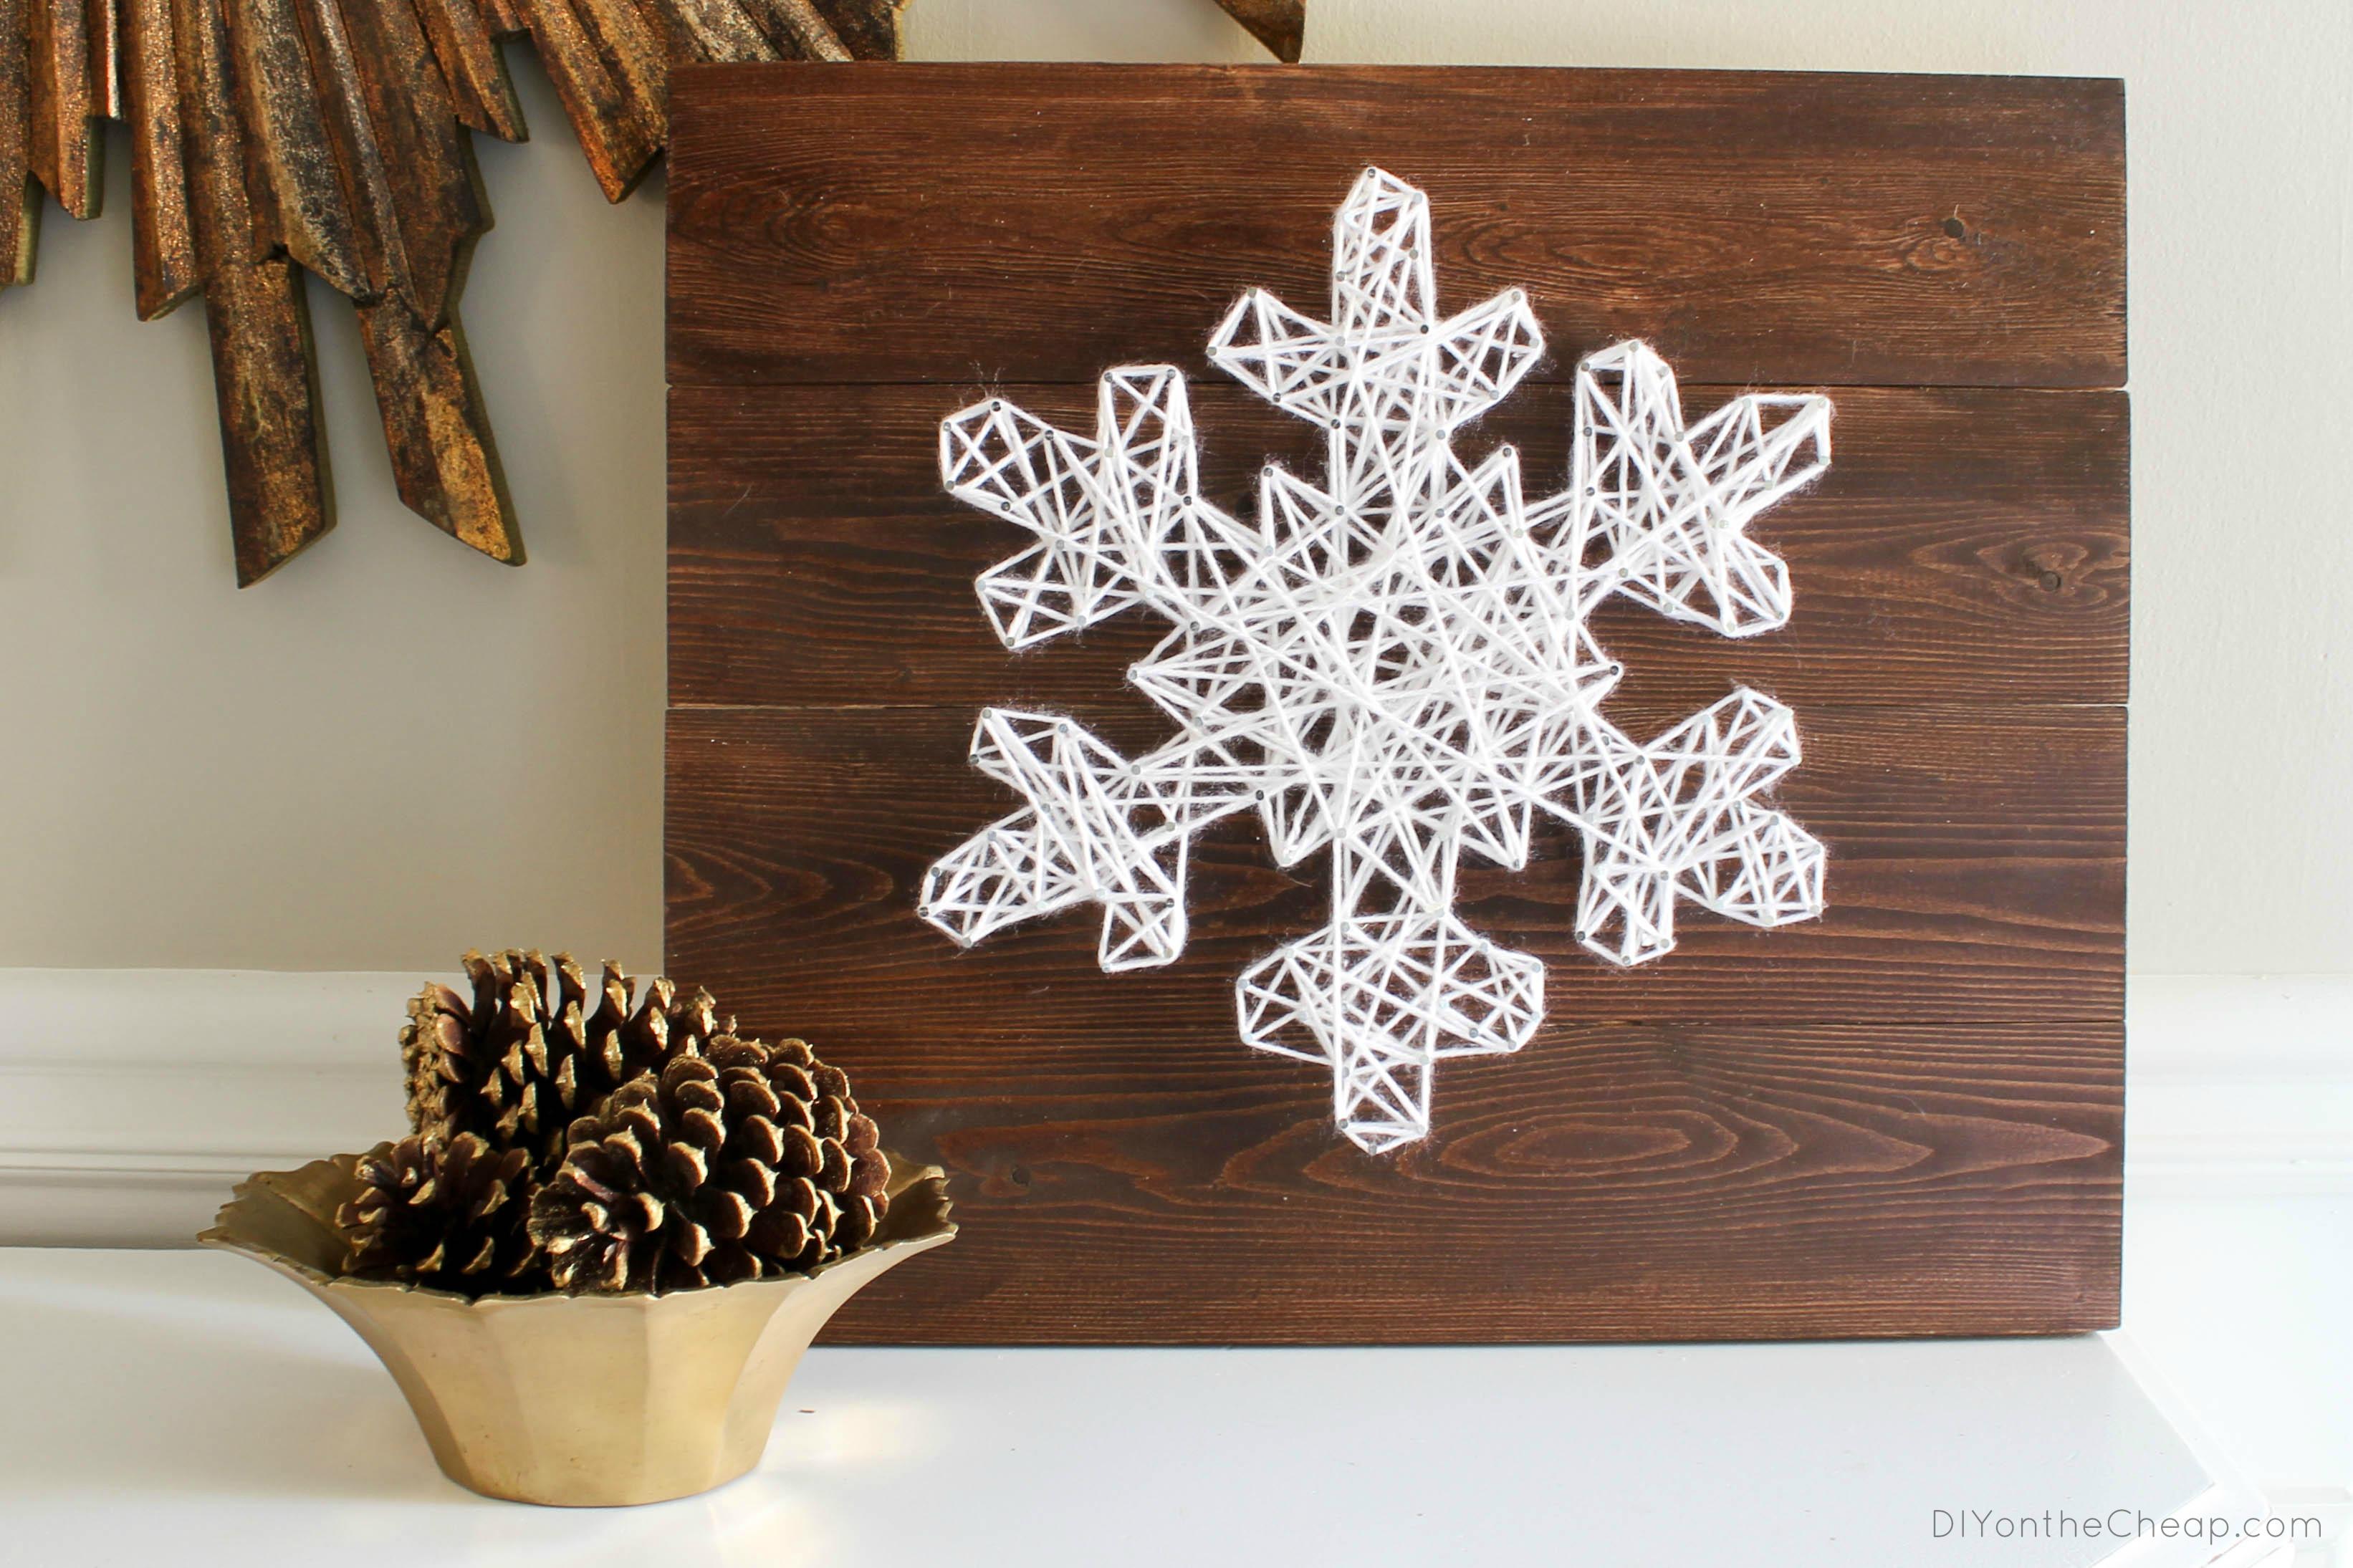 Diy Snowflake String Art 18 Easy To Build Christmas